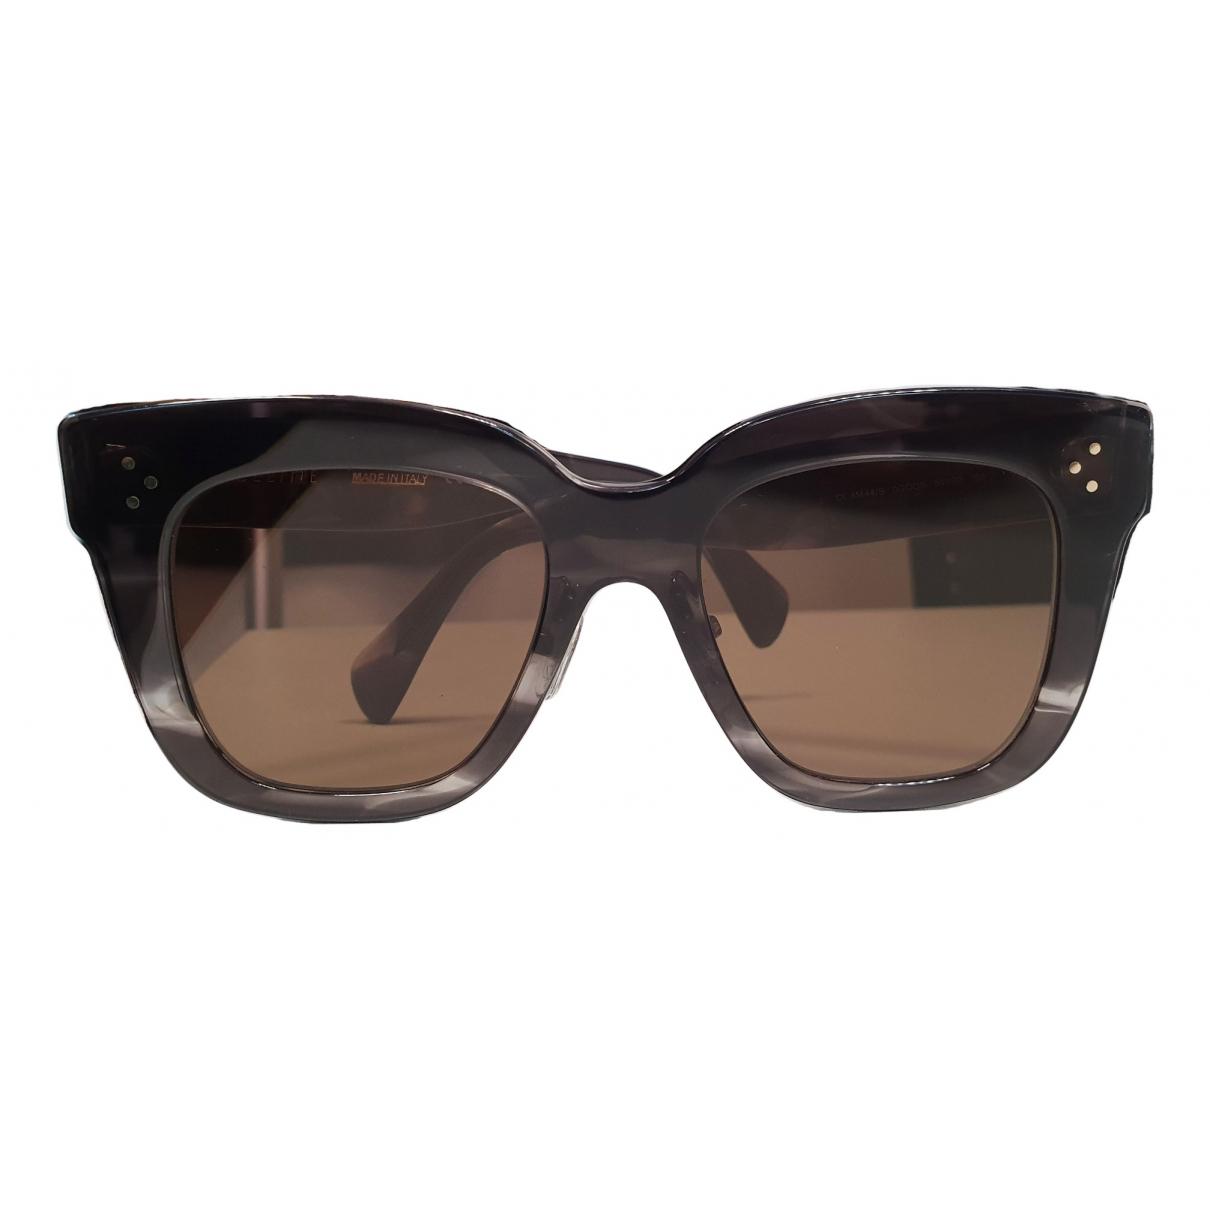 Gafas oversize Tilda Celine